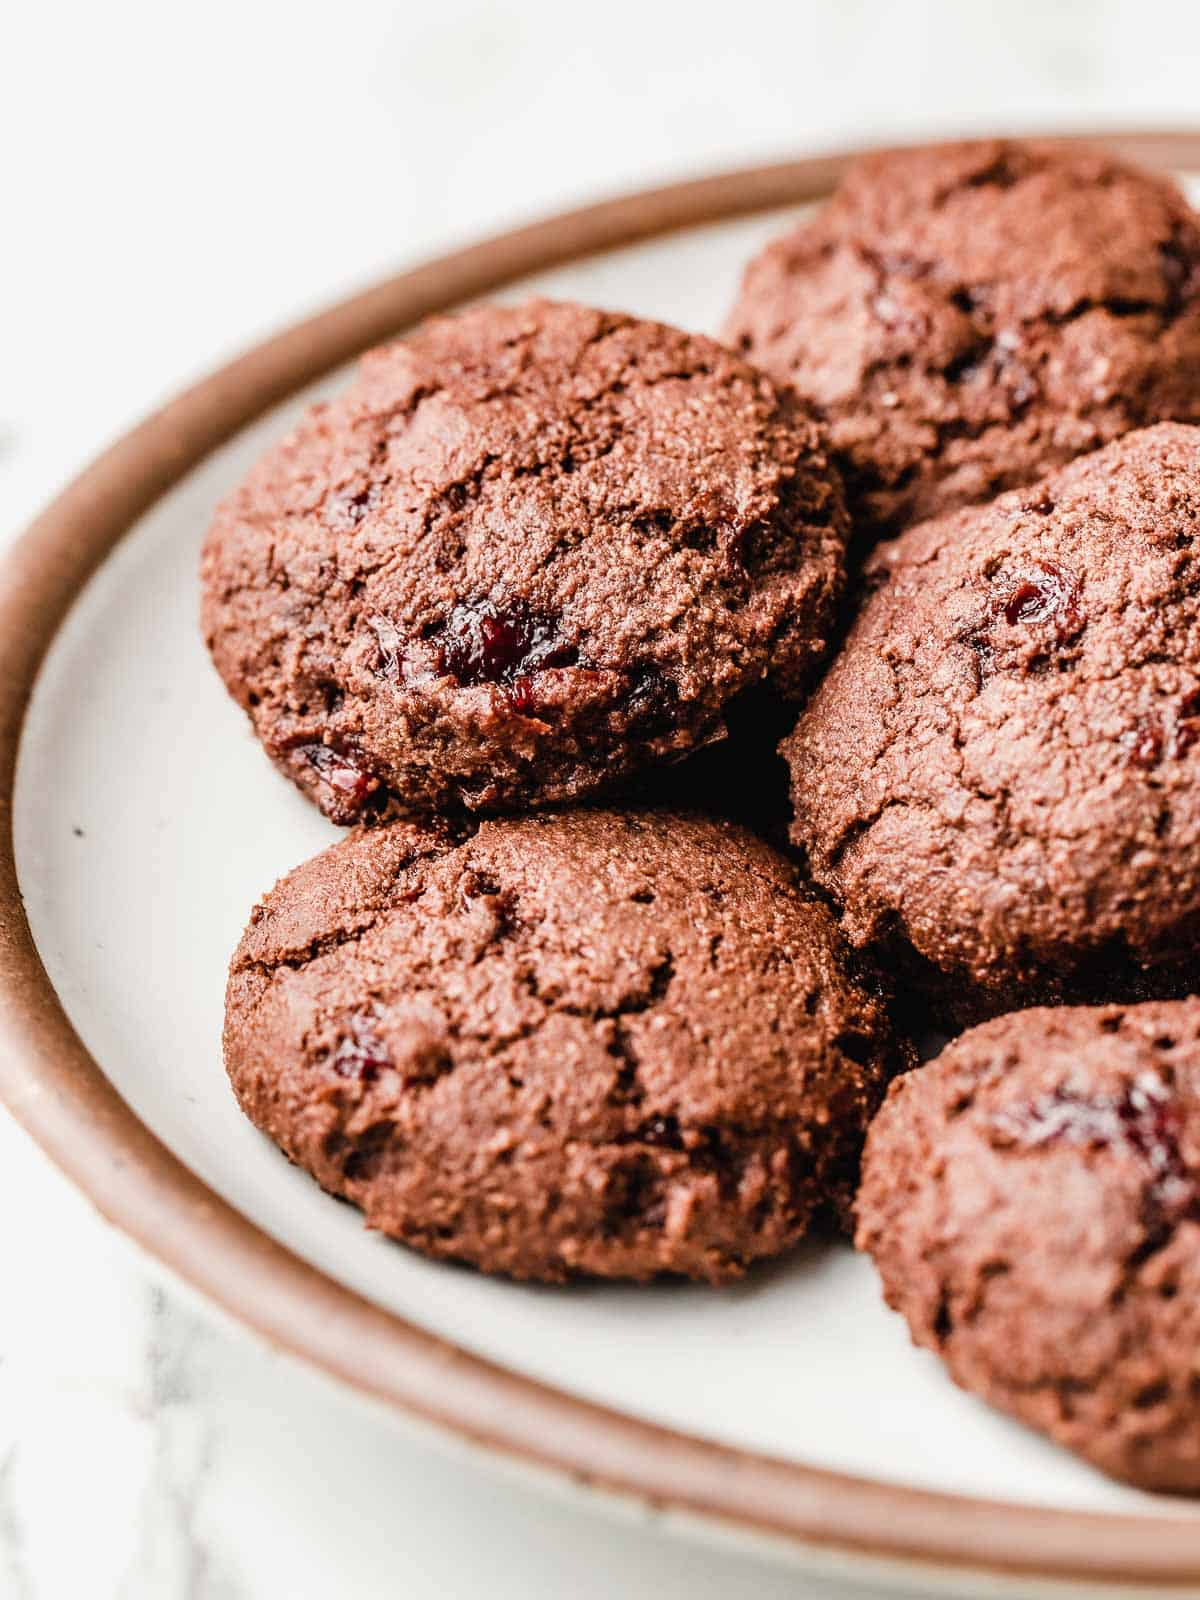 Chocolate cherry jam cookies on a plate.